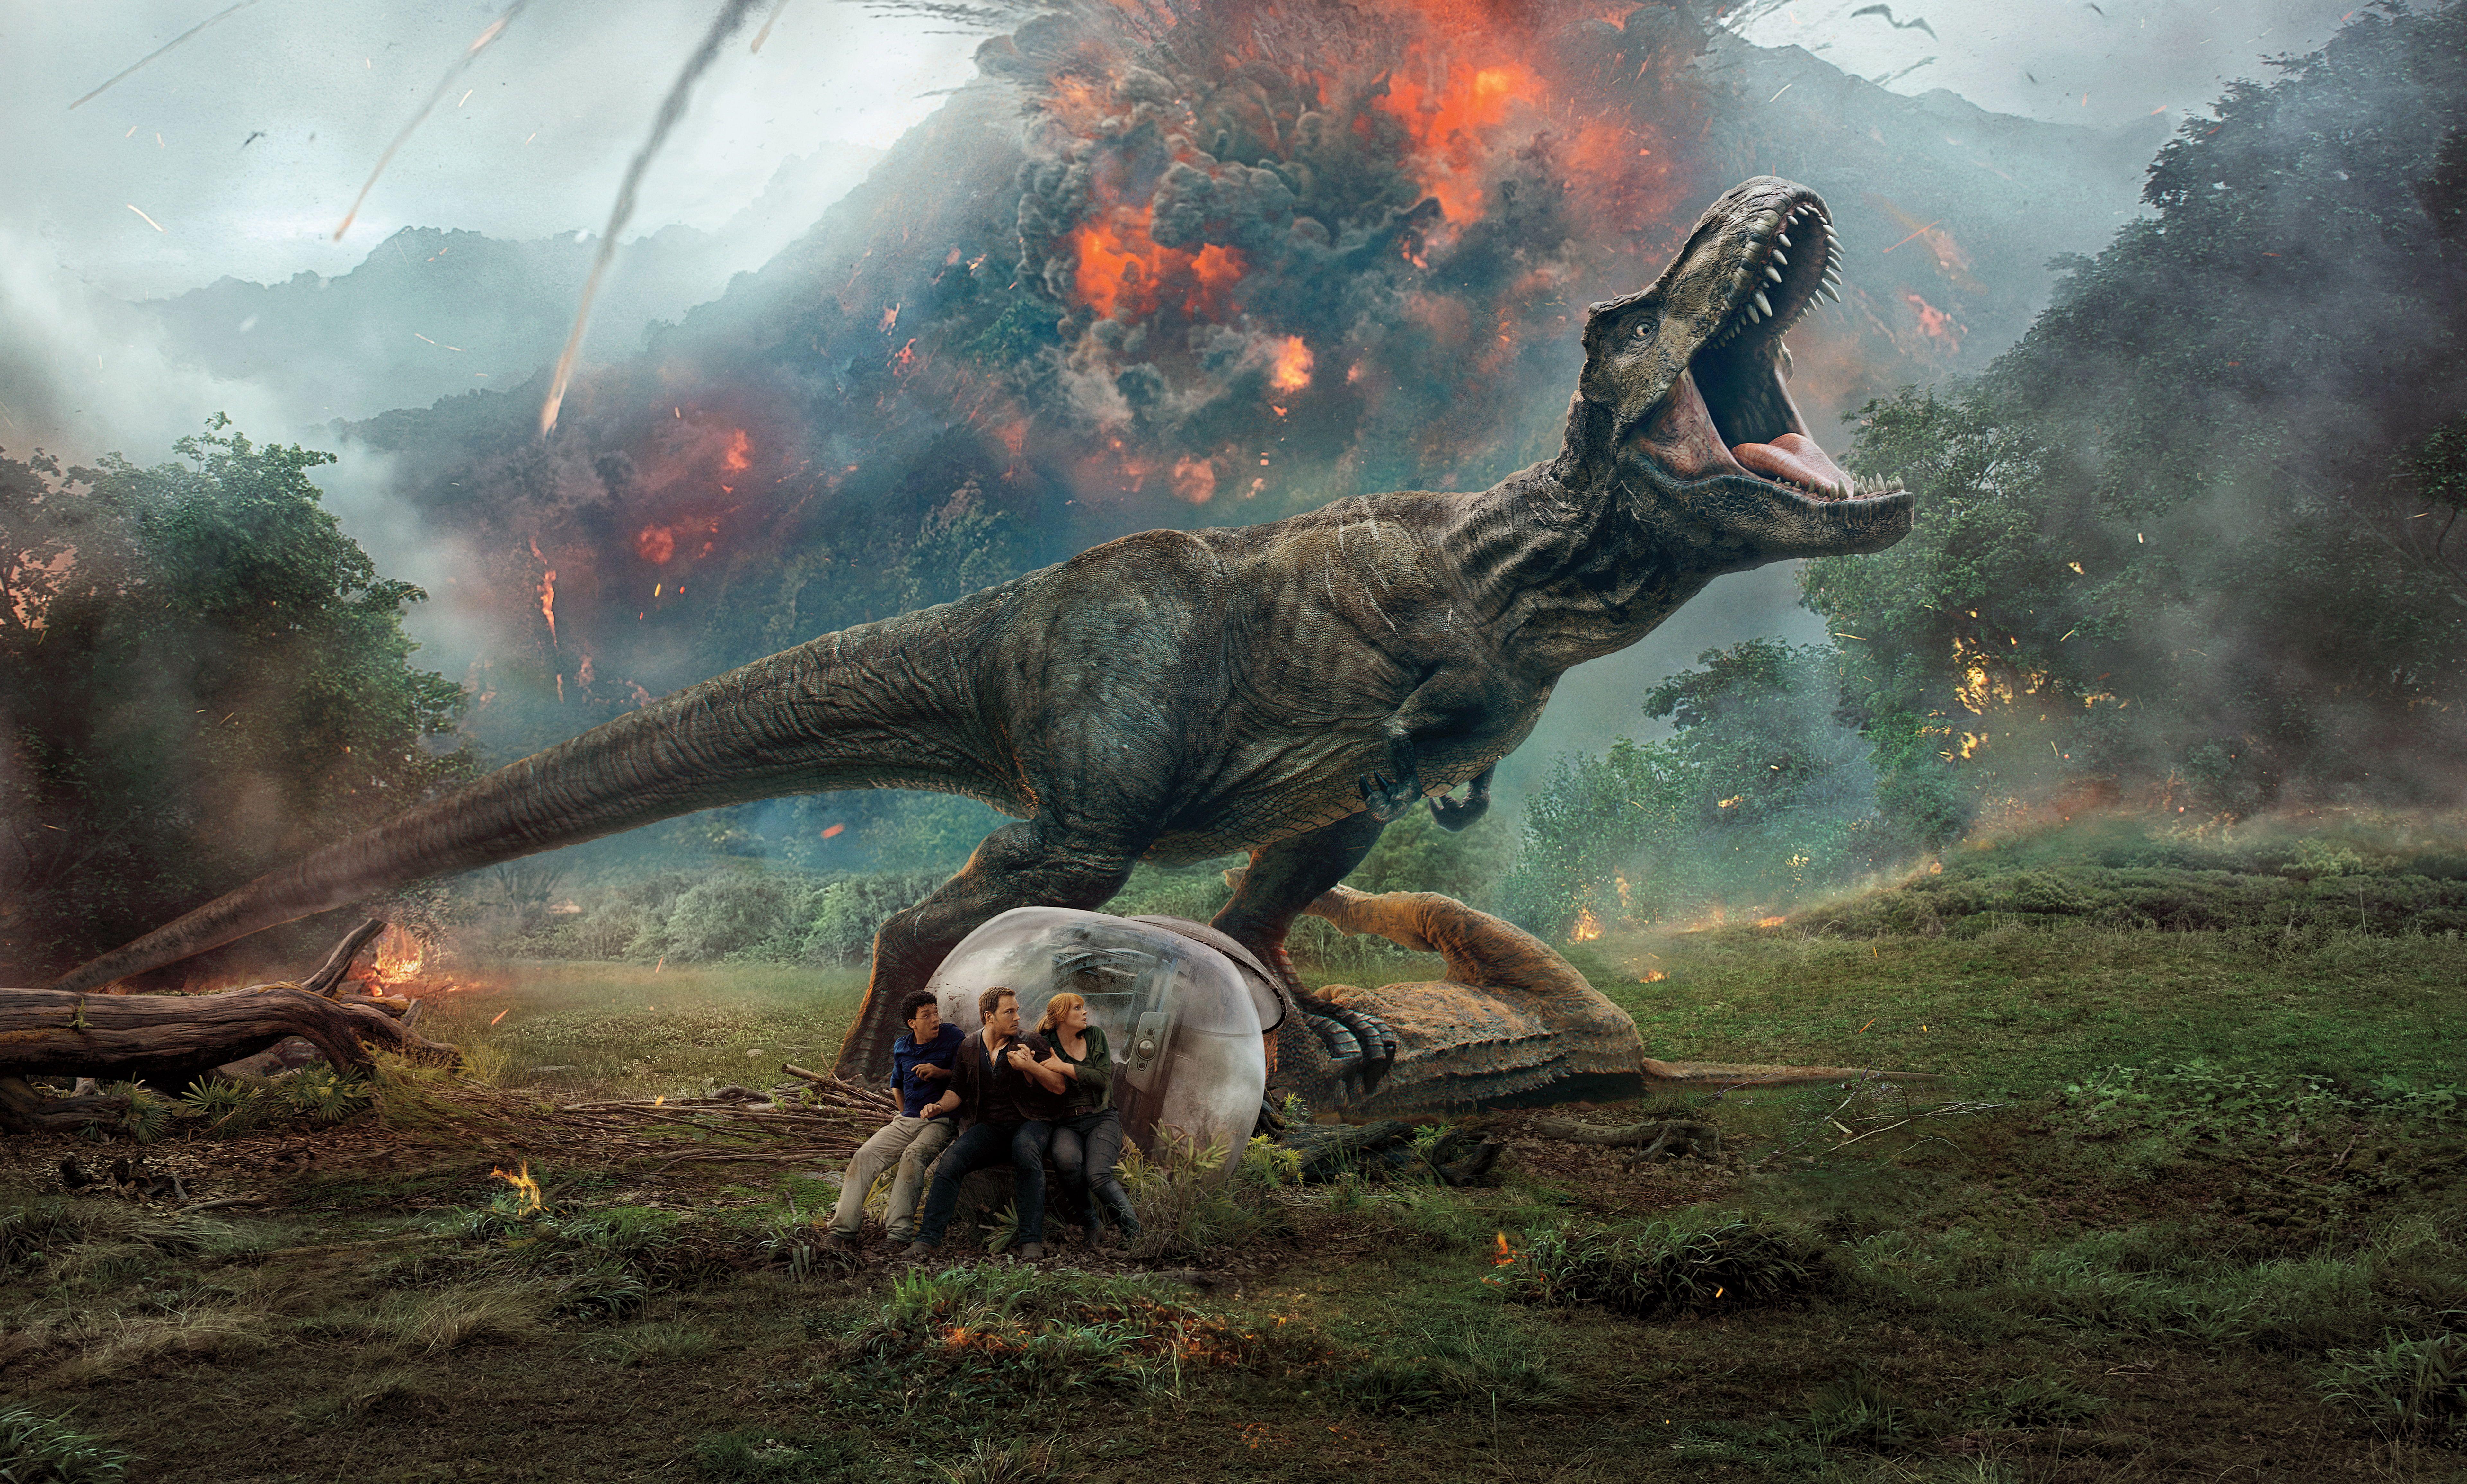 The Jurassic Park Illustration Jurassic World Fallen Kingdom 2018 4k 8k 8k Wallpape In 2020 Jurassic World Wallpaper Jurassic World Fallen Kingdom Jurassic World